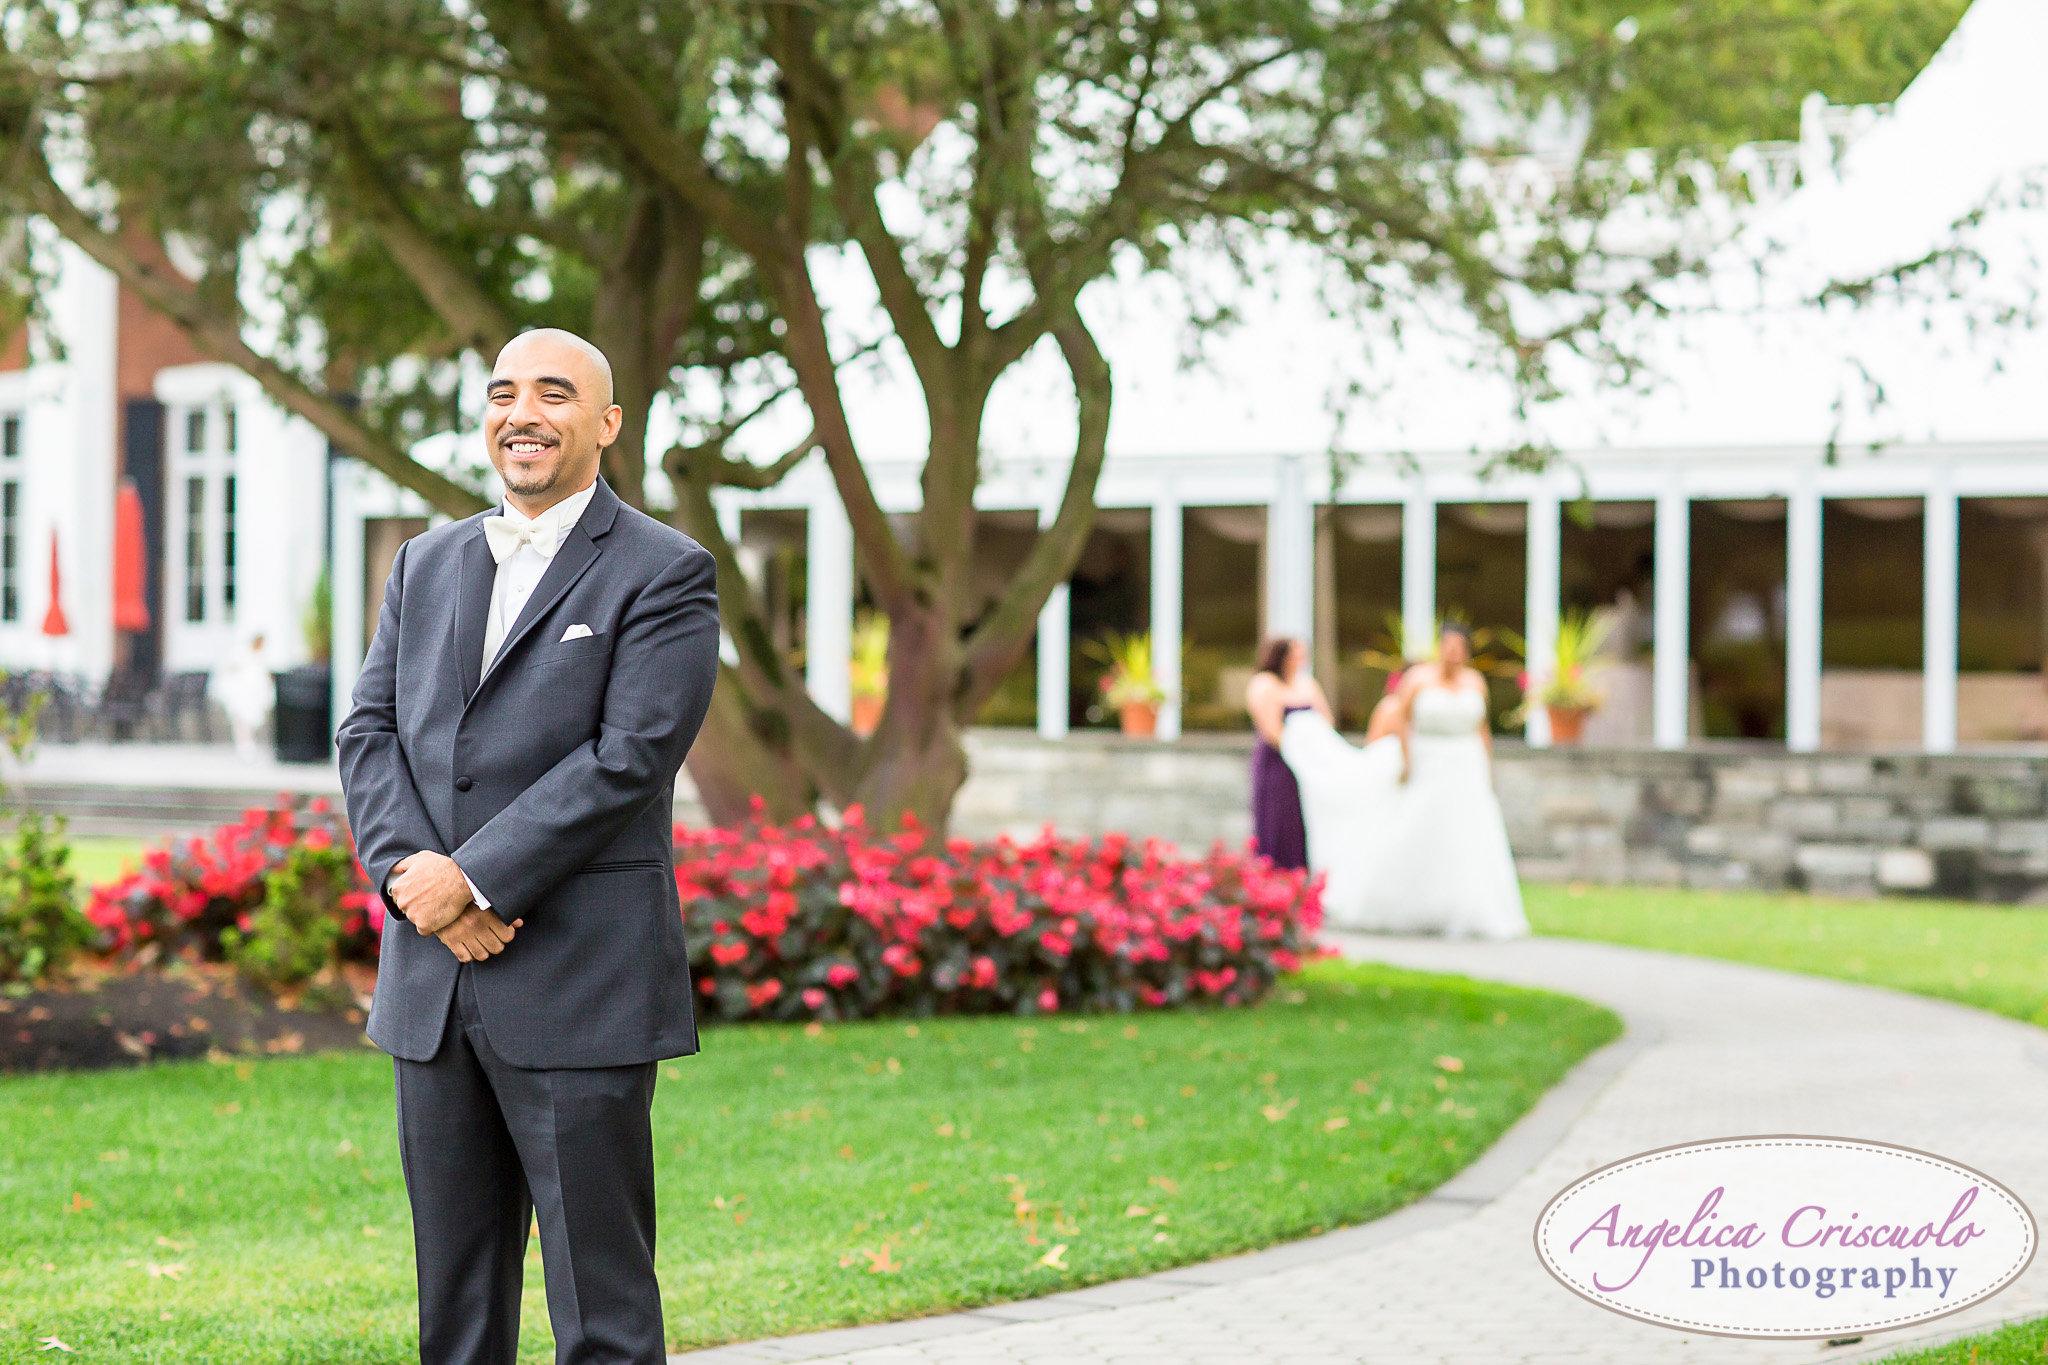 First Look Pelham Bay & Split Rock Golf Course Wedding in the Bronx